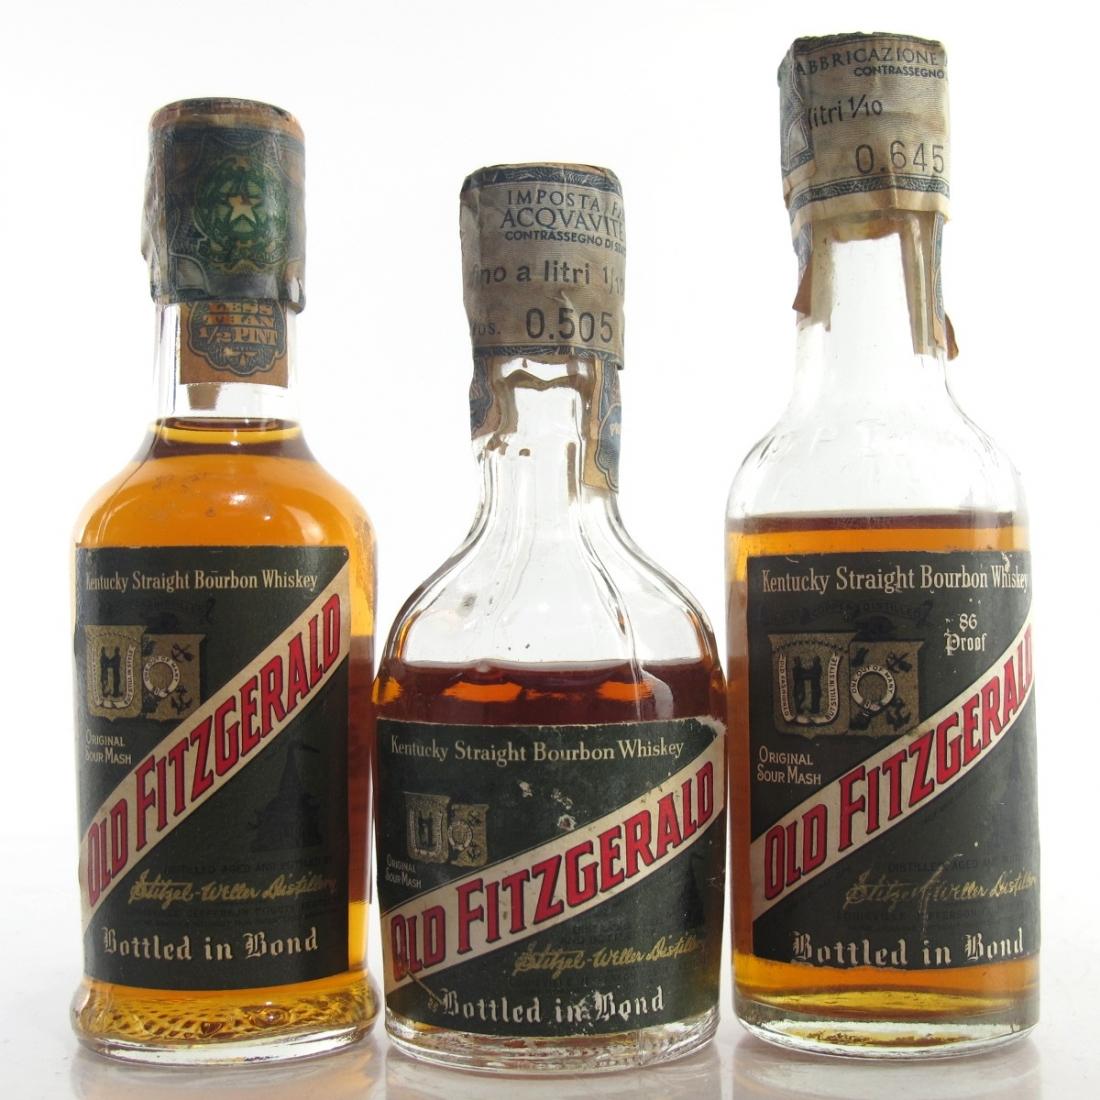 Old Fitzgerald Miniature Selection 3 x 1/10 Pint / Stitzel-Weller